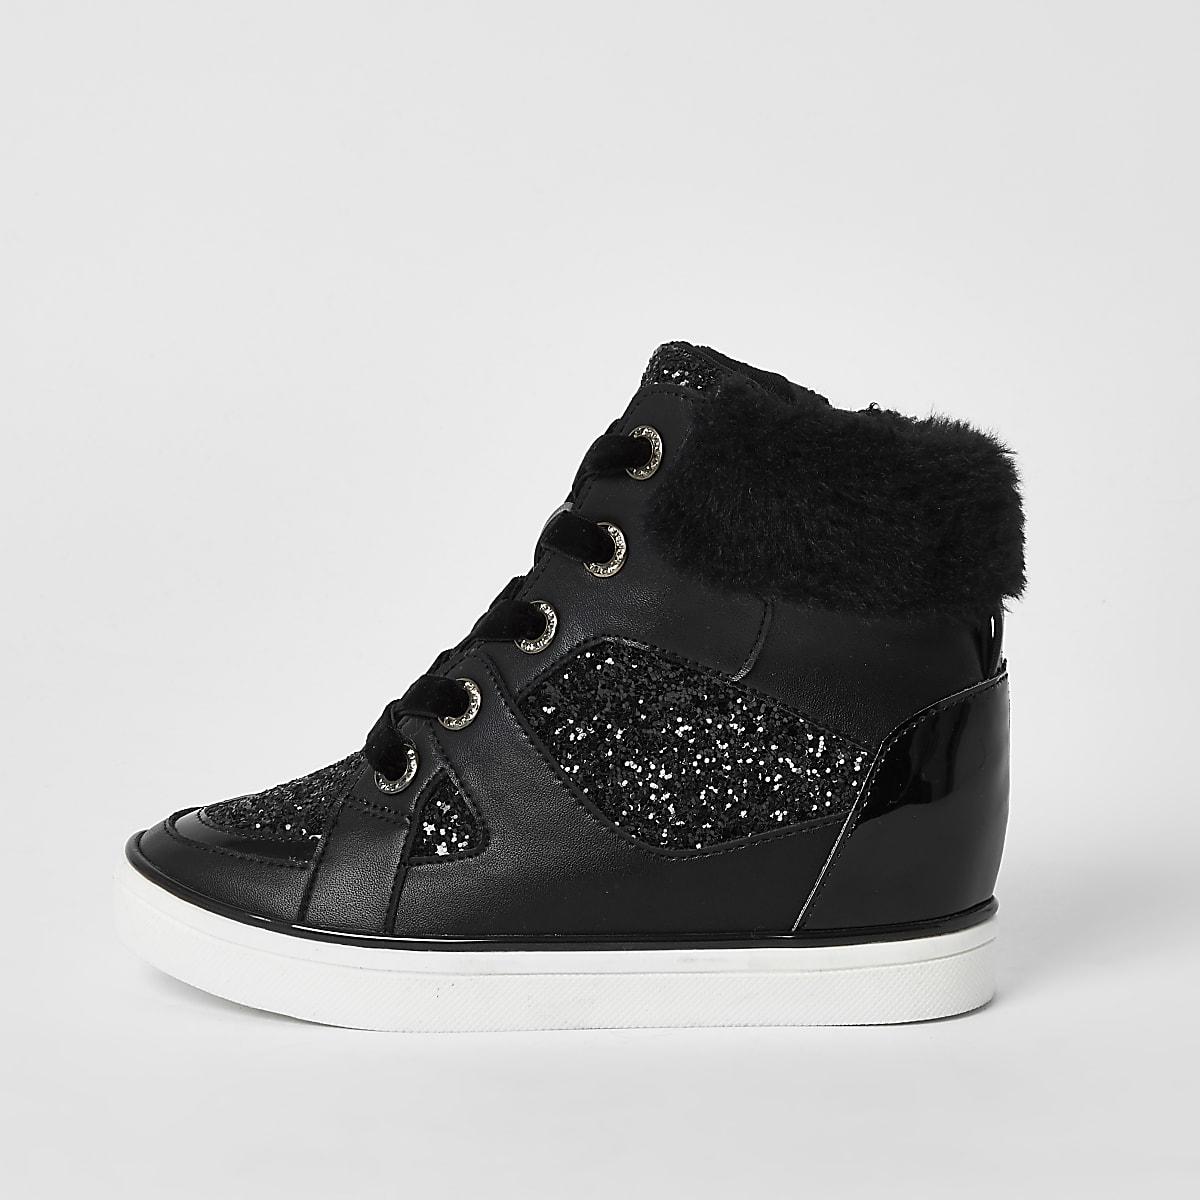 Girls black glitter lace-up hi top trainers